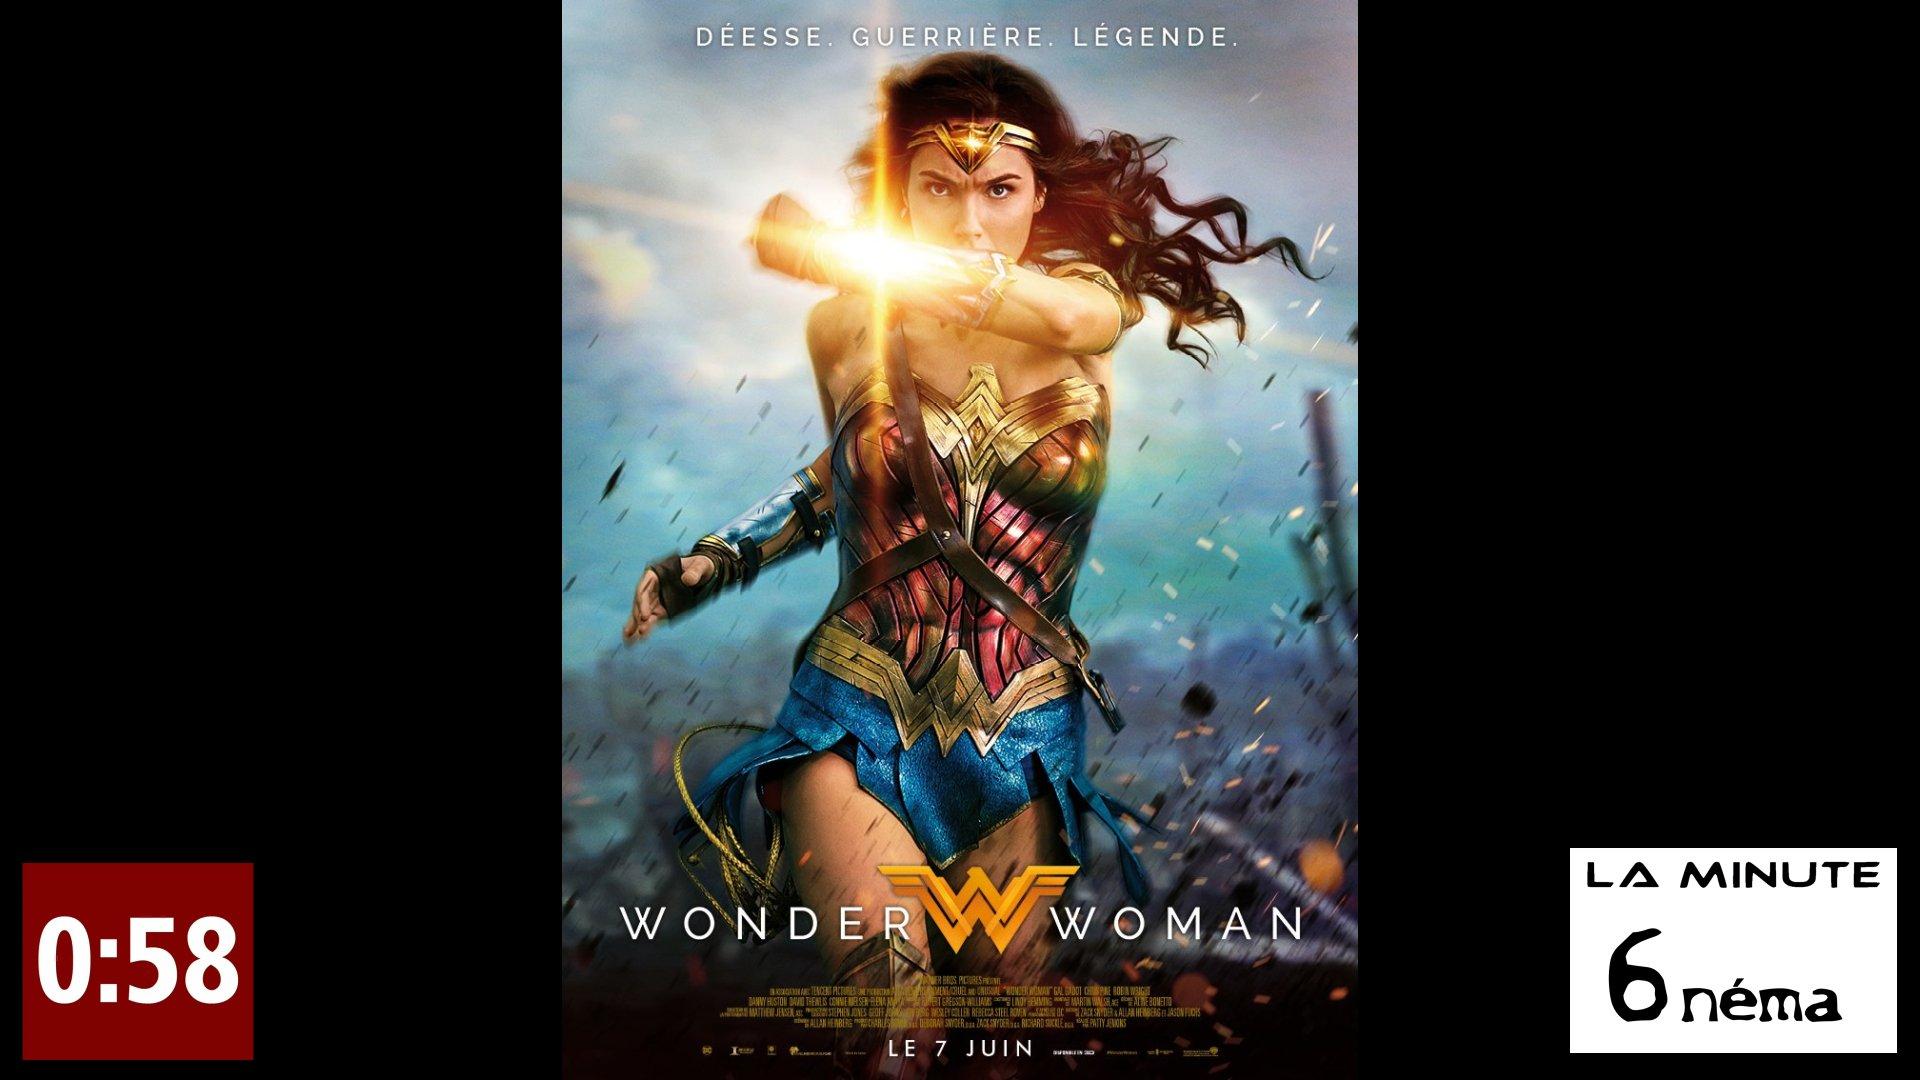 la minute 6nema N°19 - Wonder Woman sans spoiler